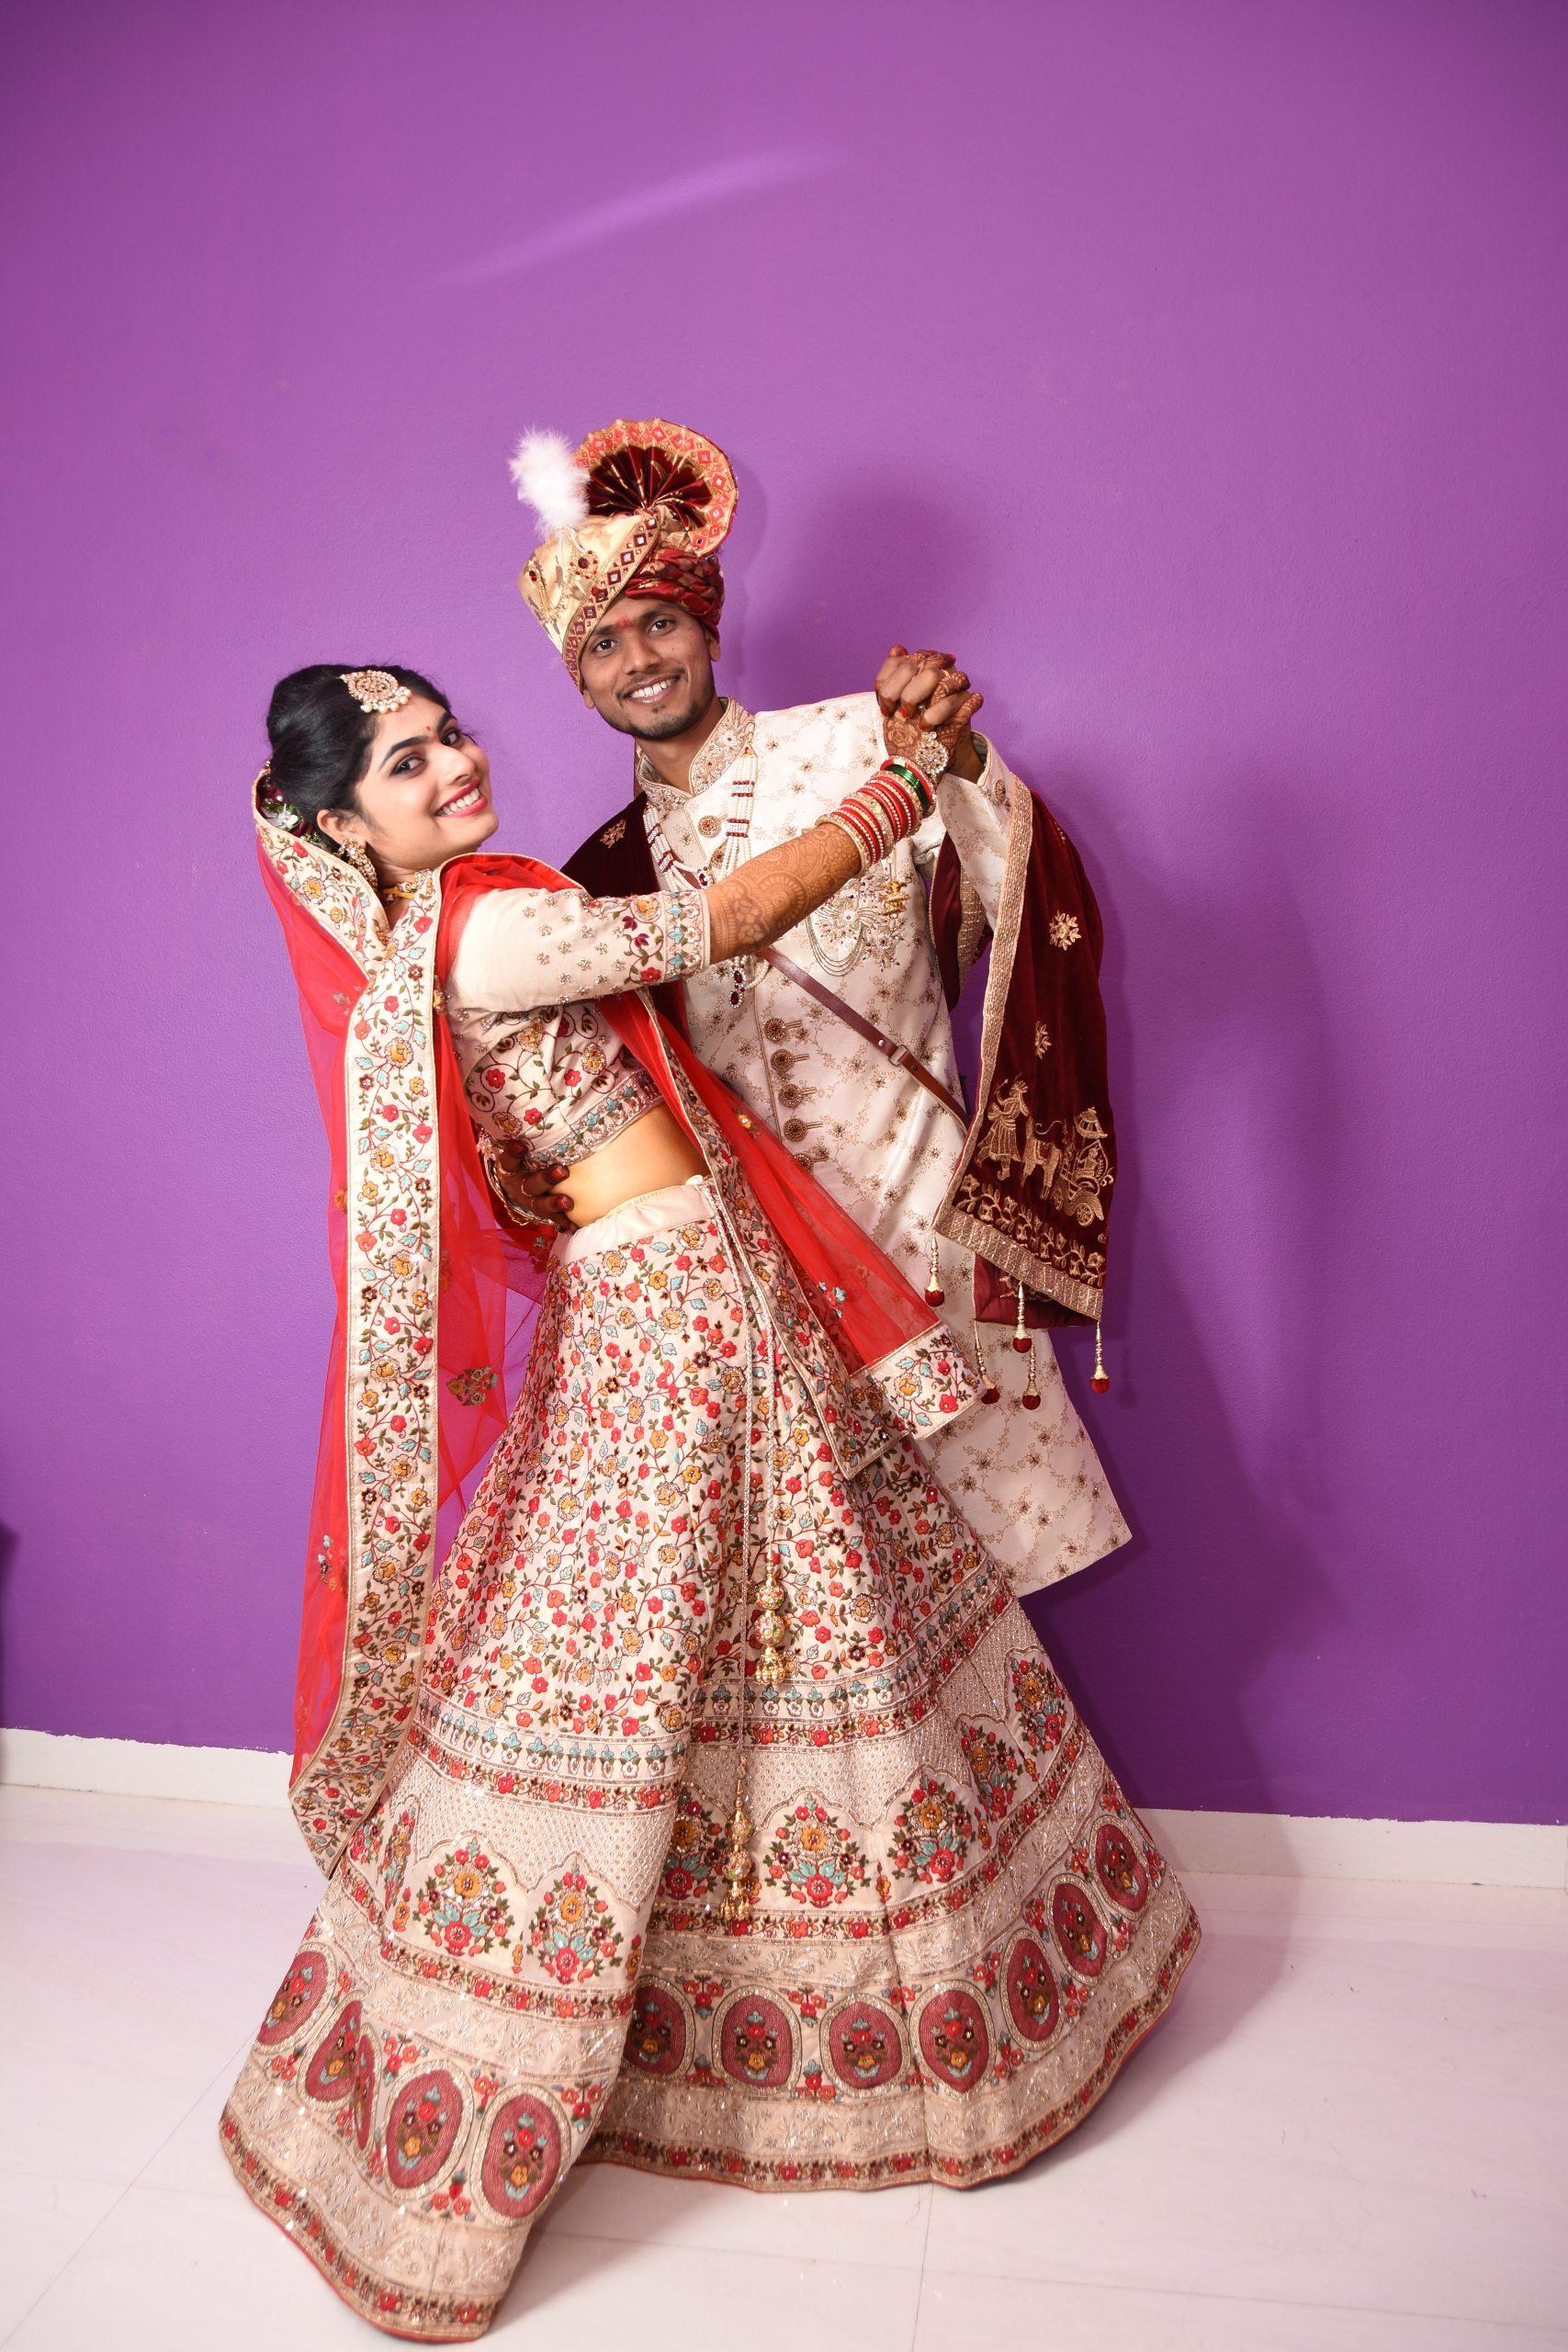 A wedding couple dance pose